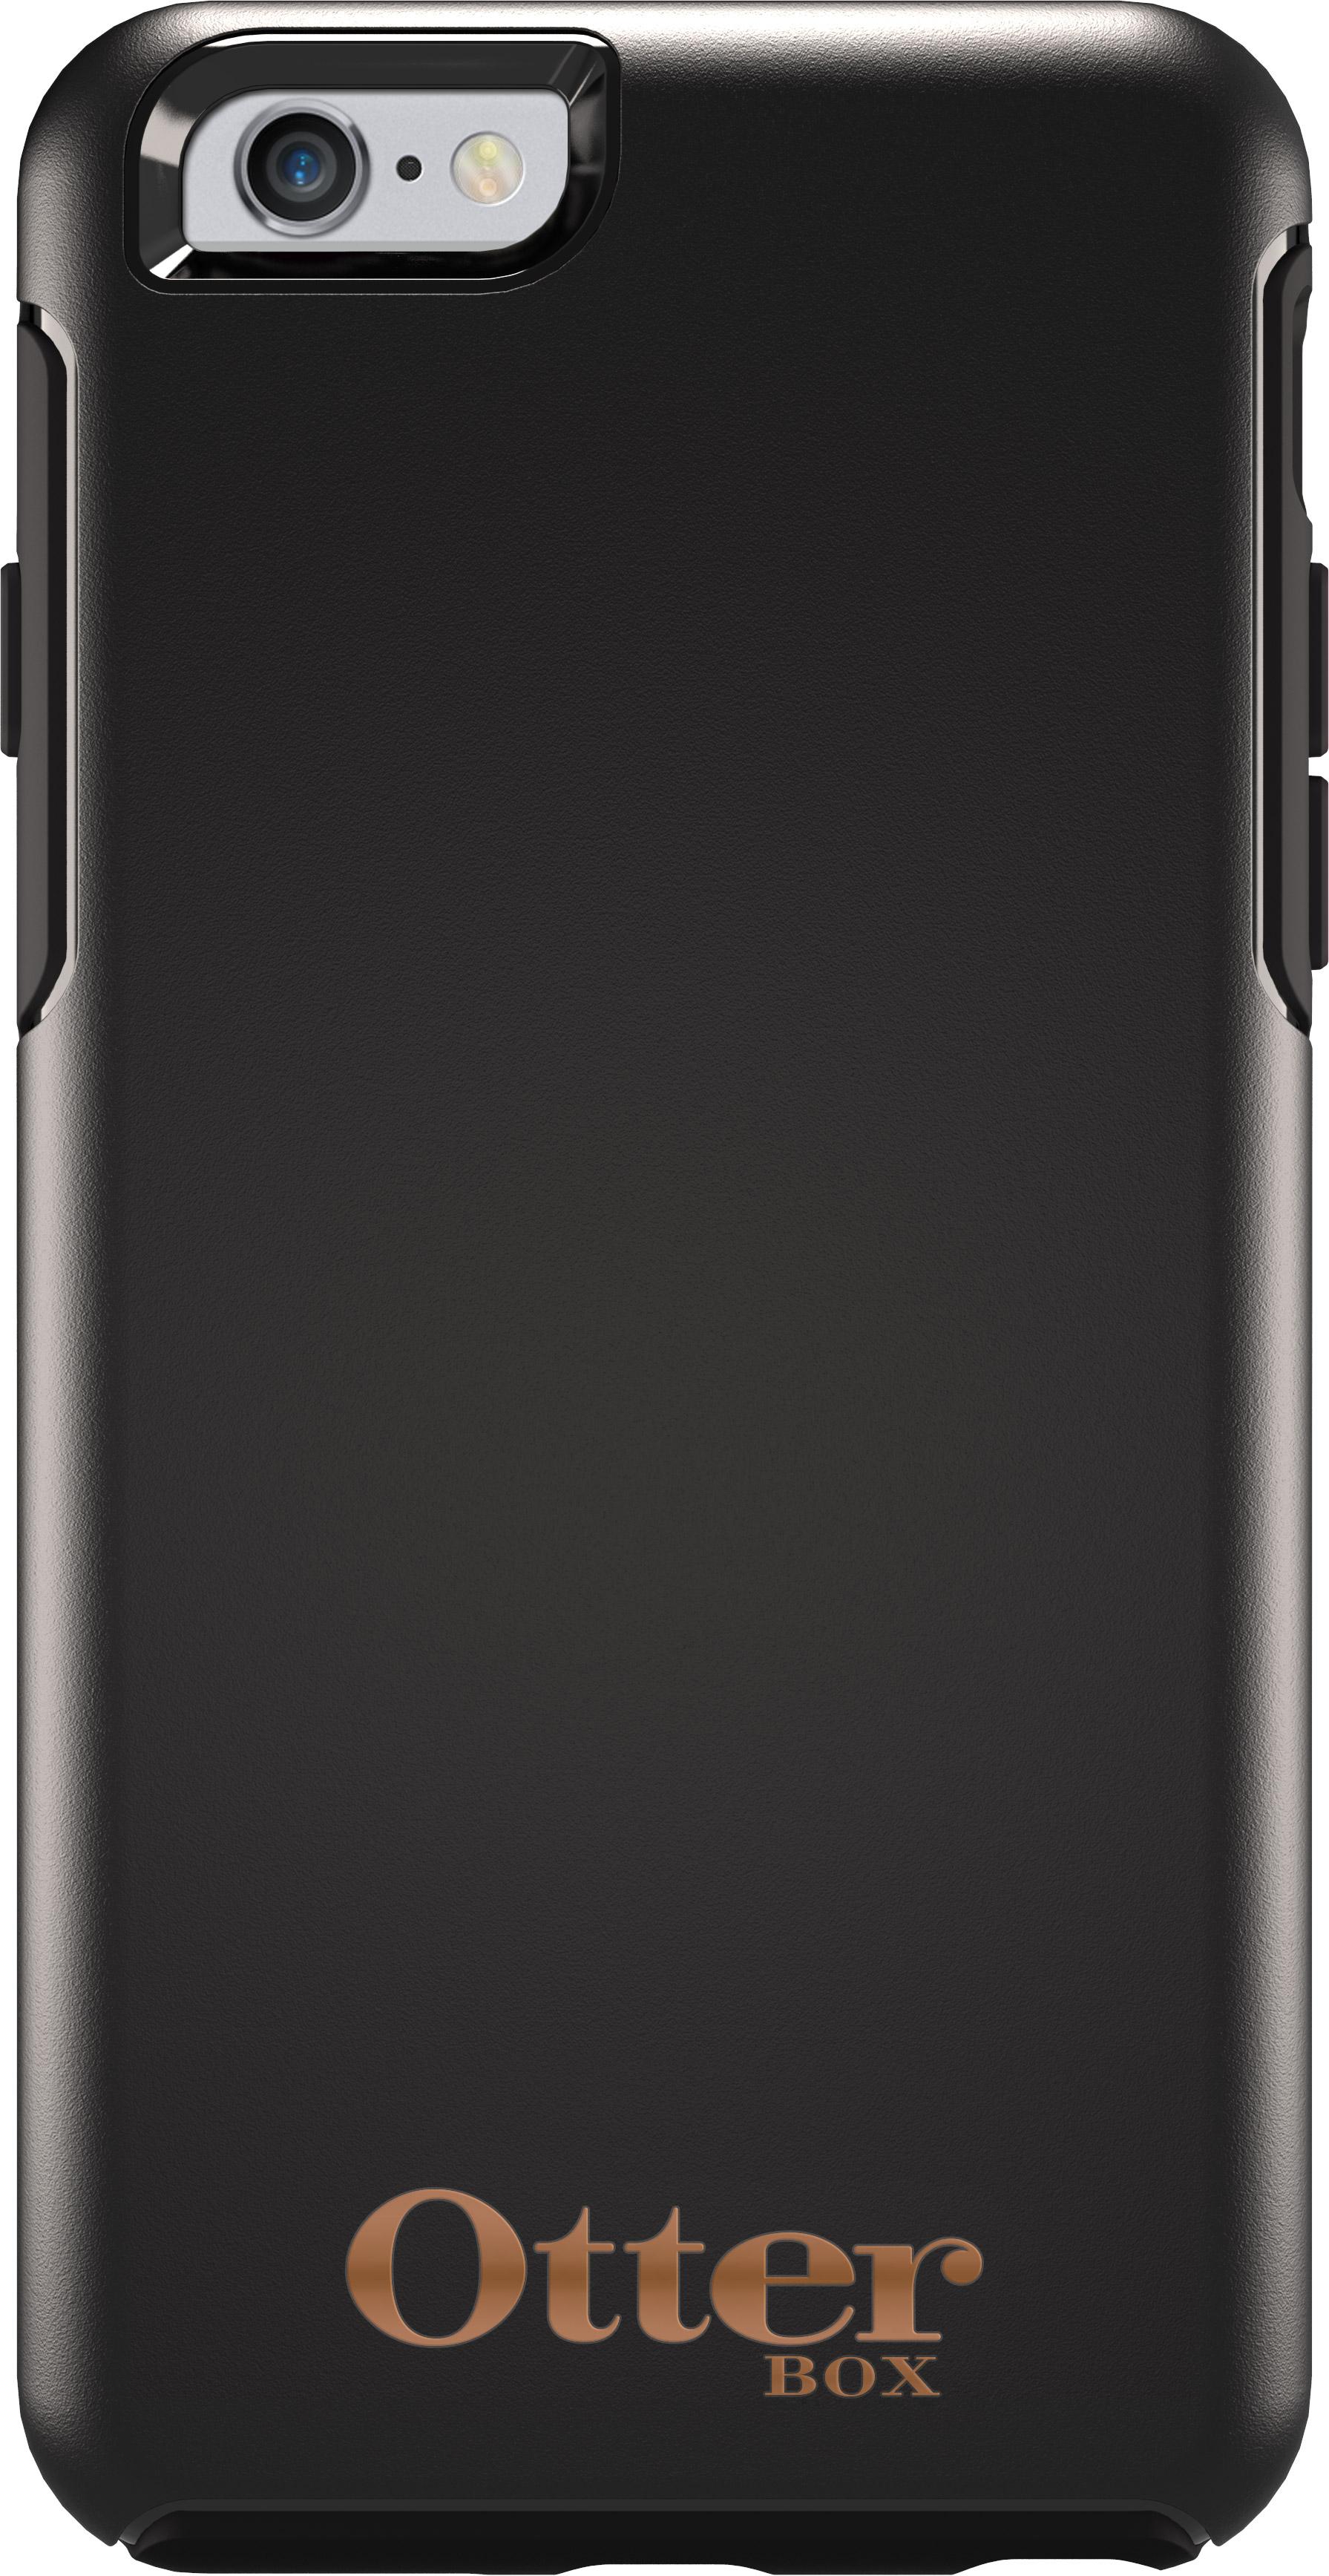 OtterBox iPhone 6s plus case - Symmetry Series Metallic Finish